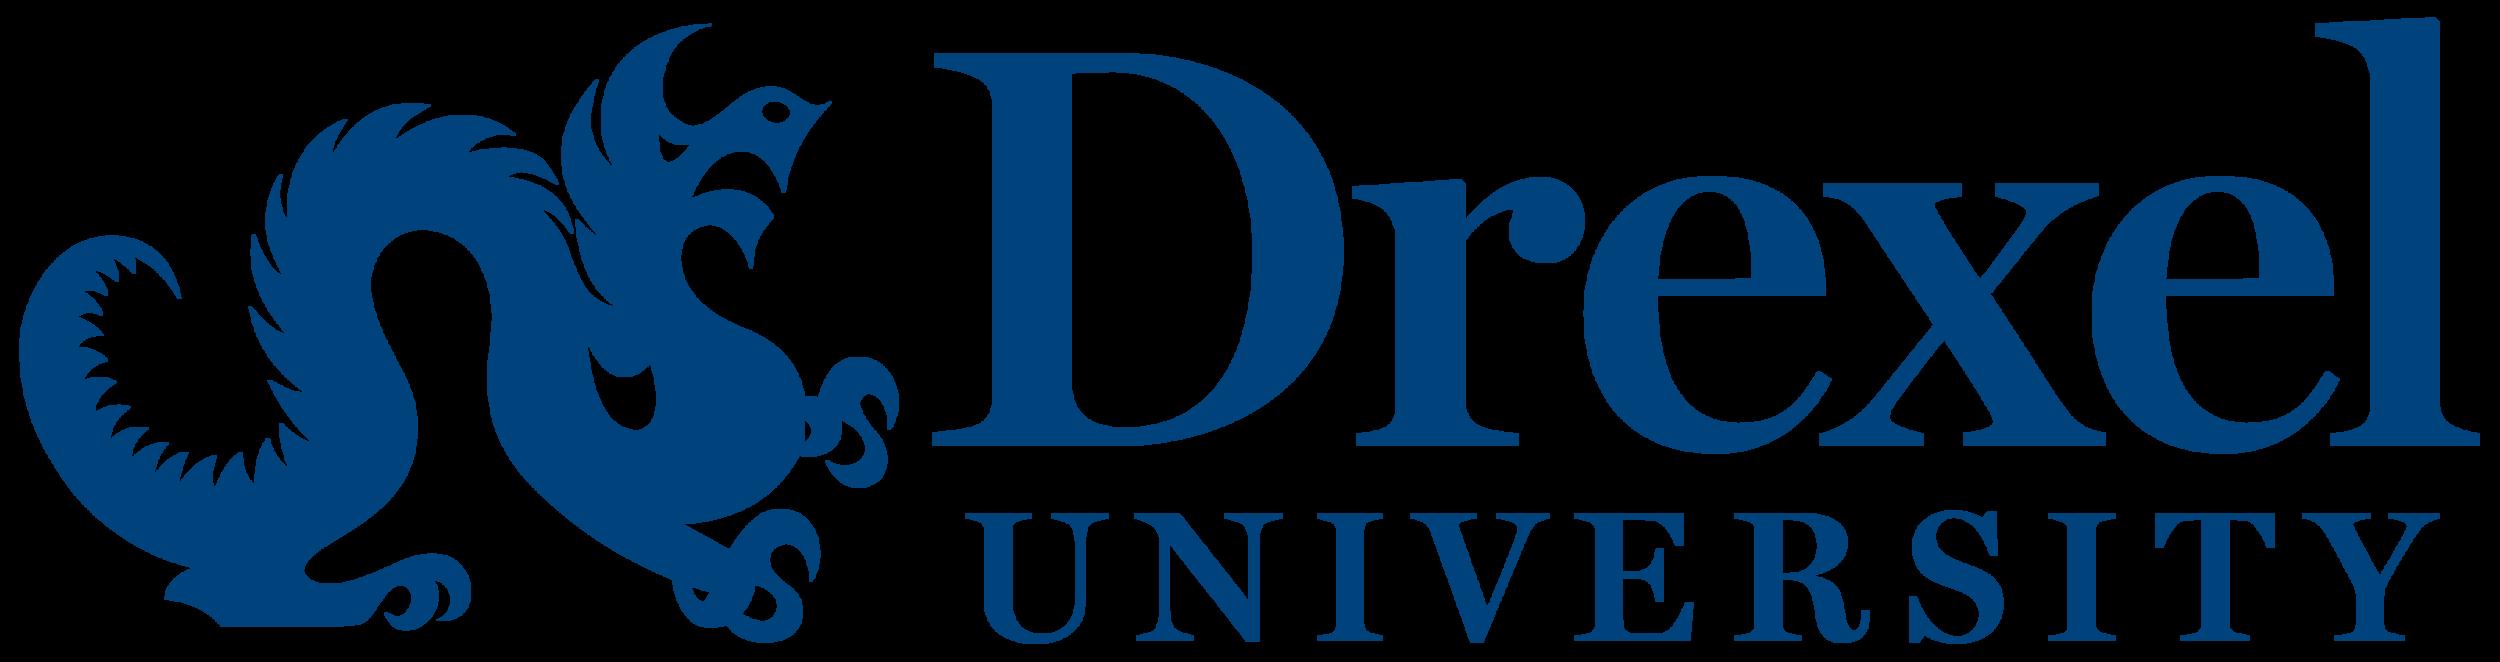 Drexel_university_logo-2.png